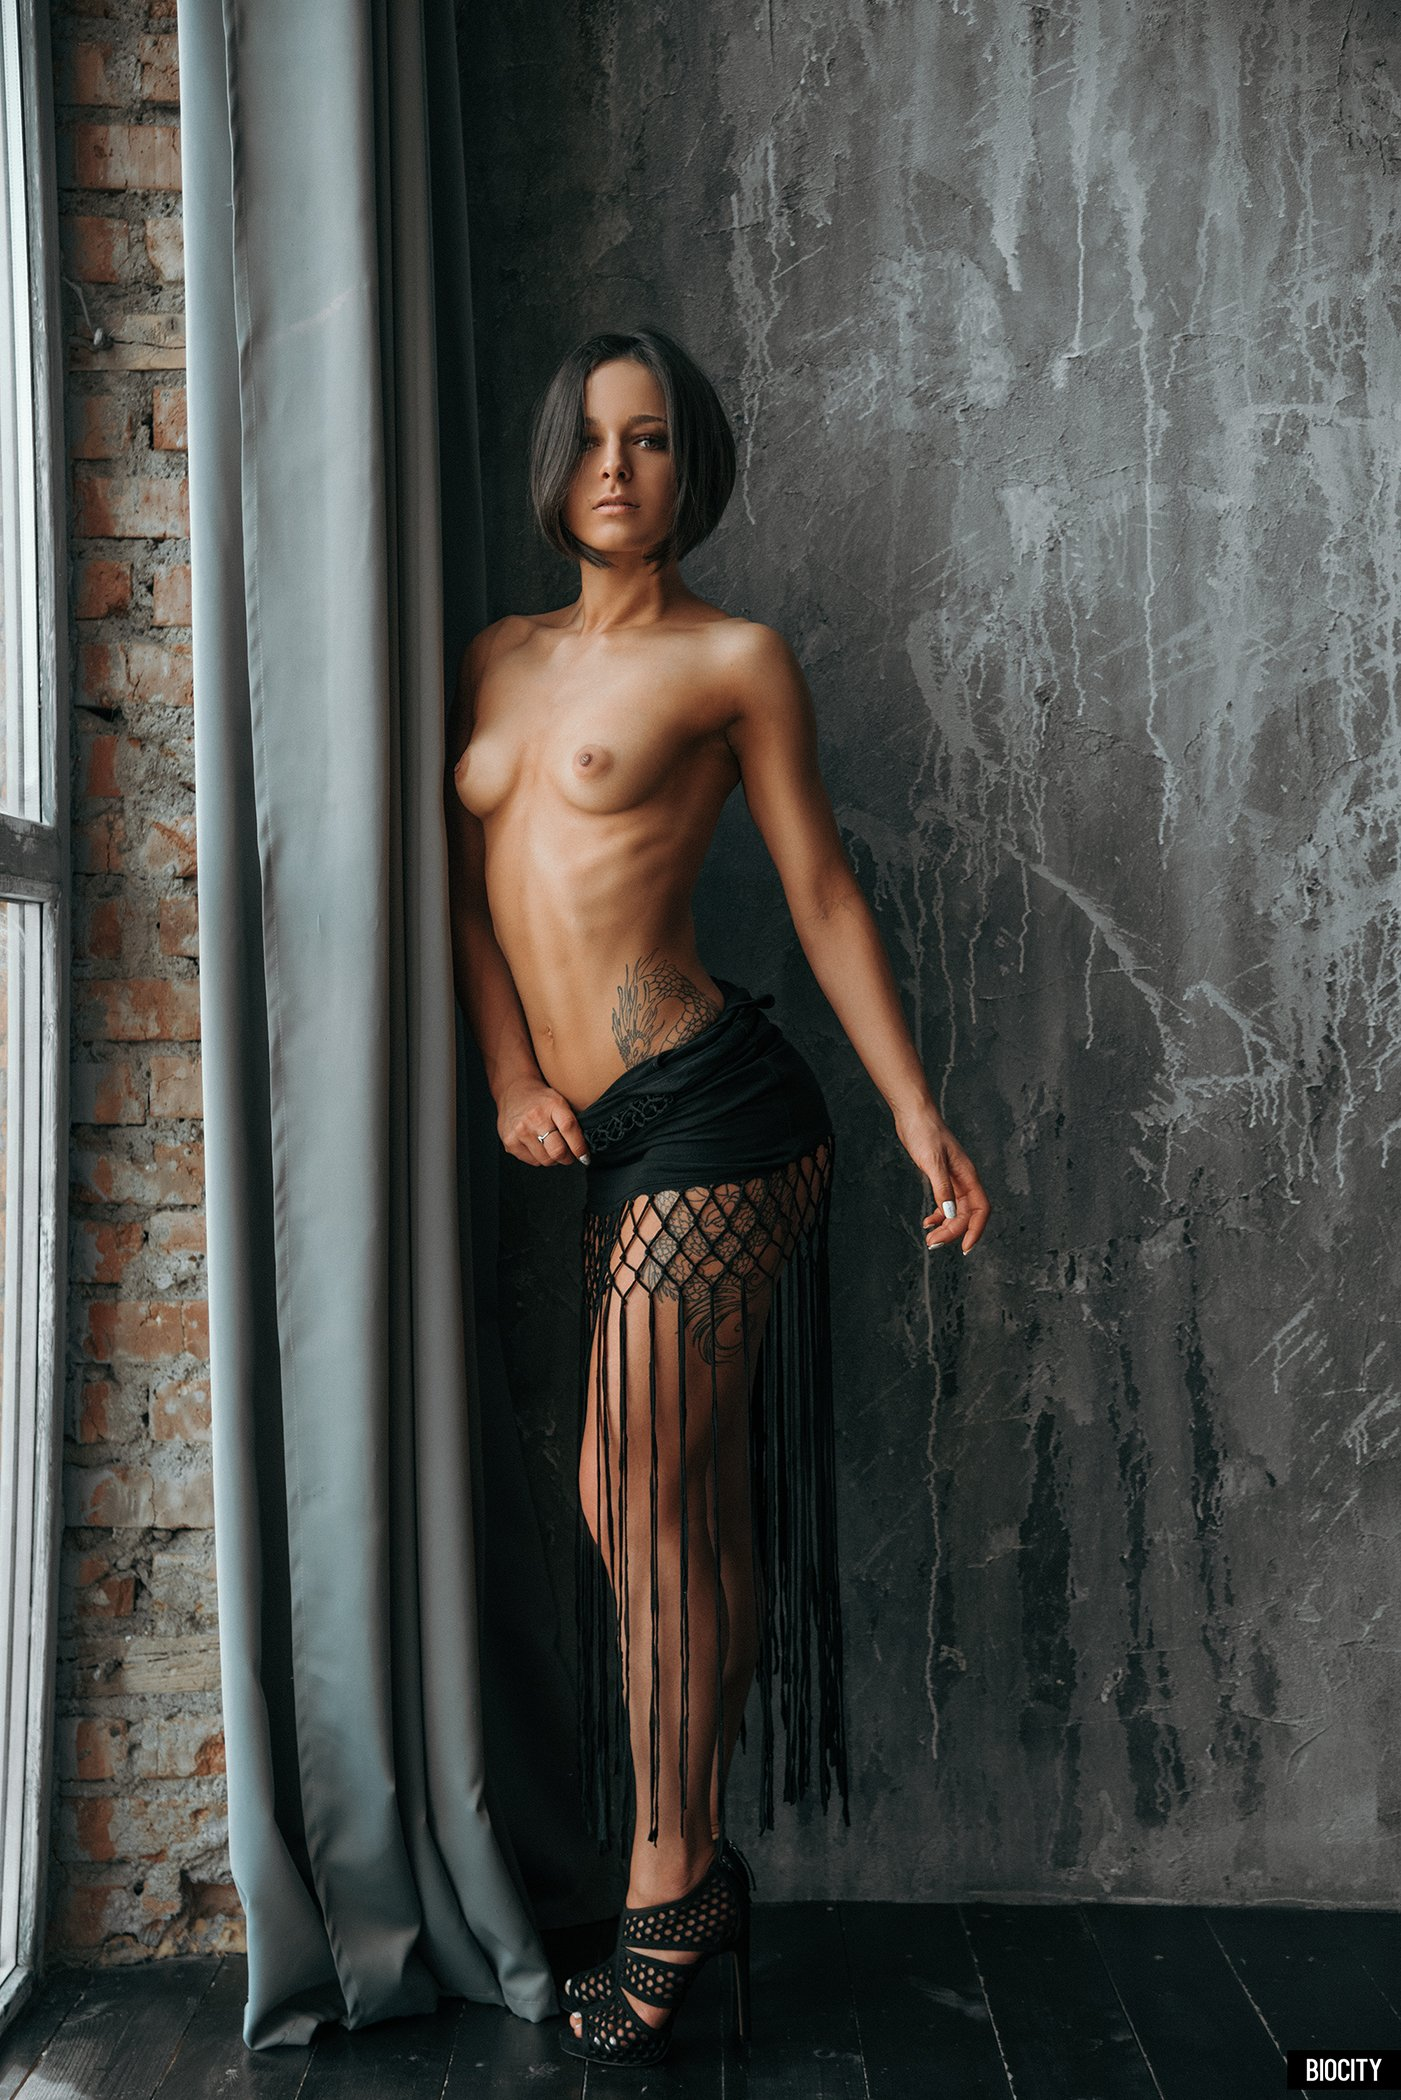 Biocity, BiocityMonte, Erotic, Girl, Model, Nikon, Nude, Девушка, Модель, Ню, Пашакарпенко, Эротика, Biocity Monte